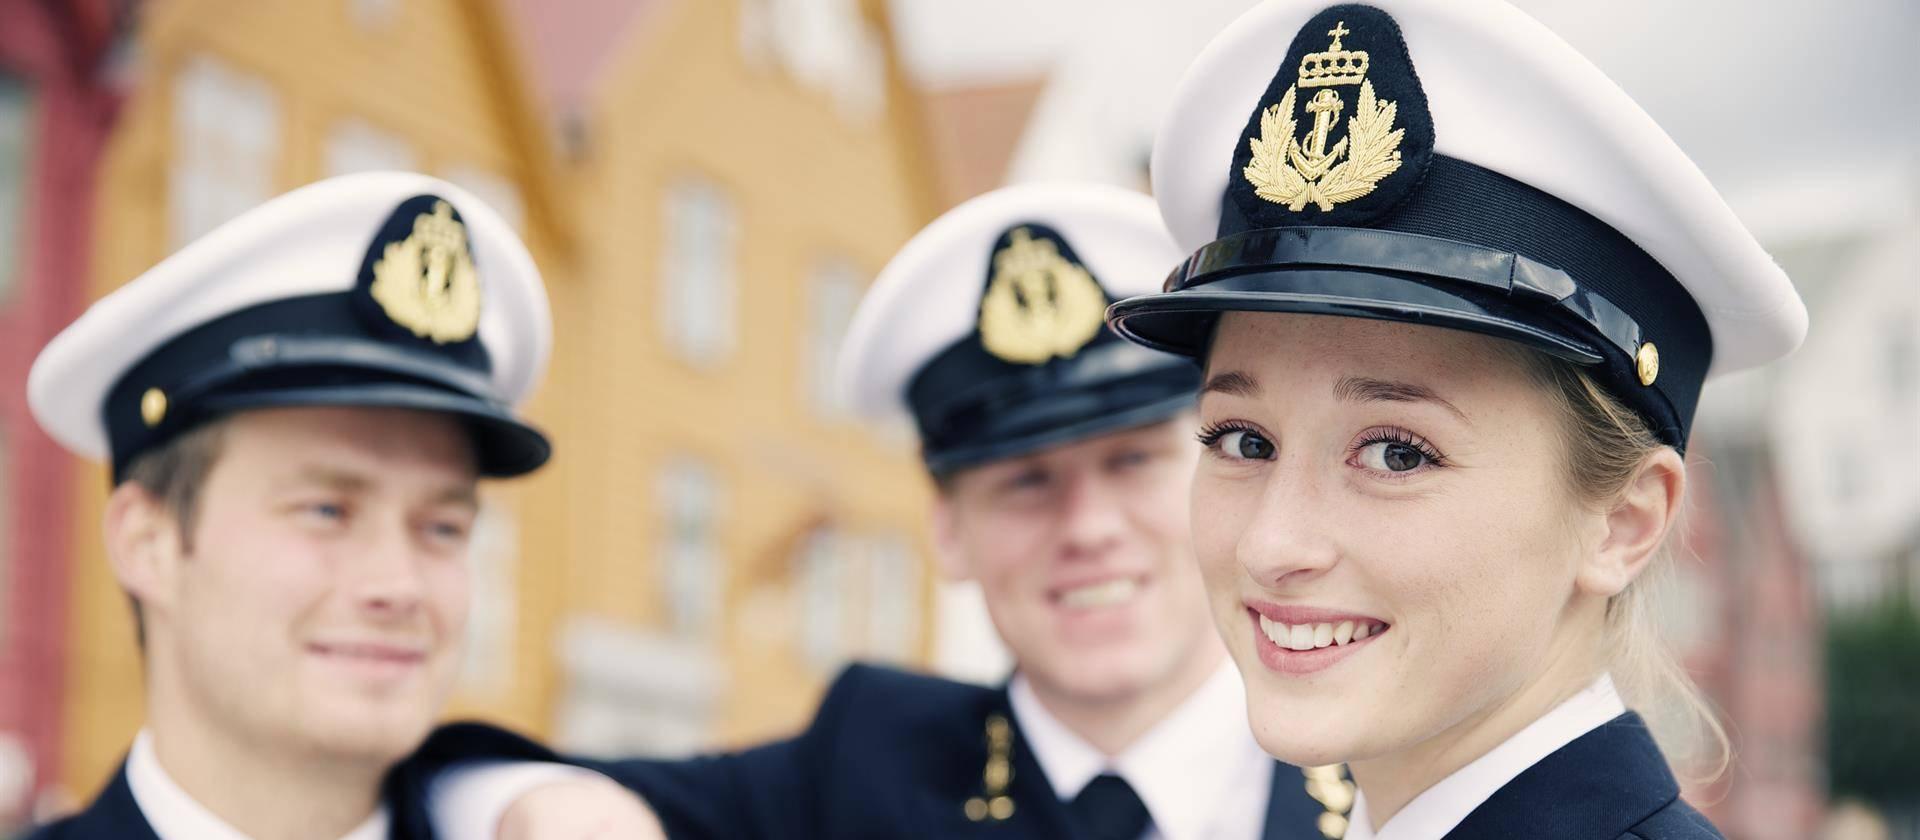 Norwegian Naval Academy Emblem